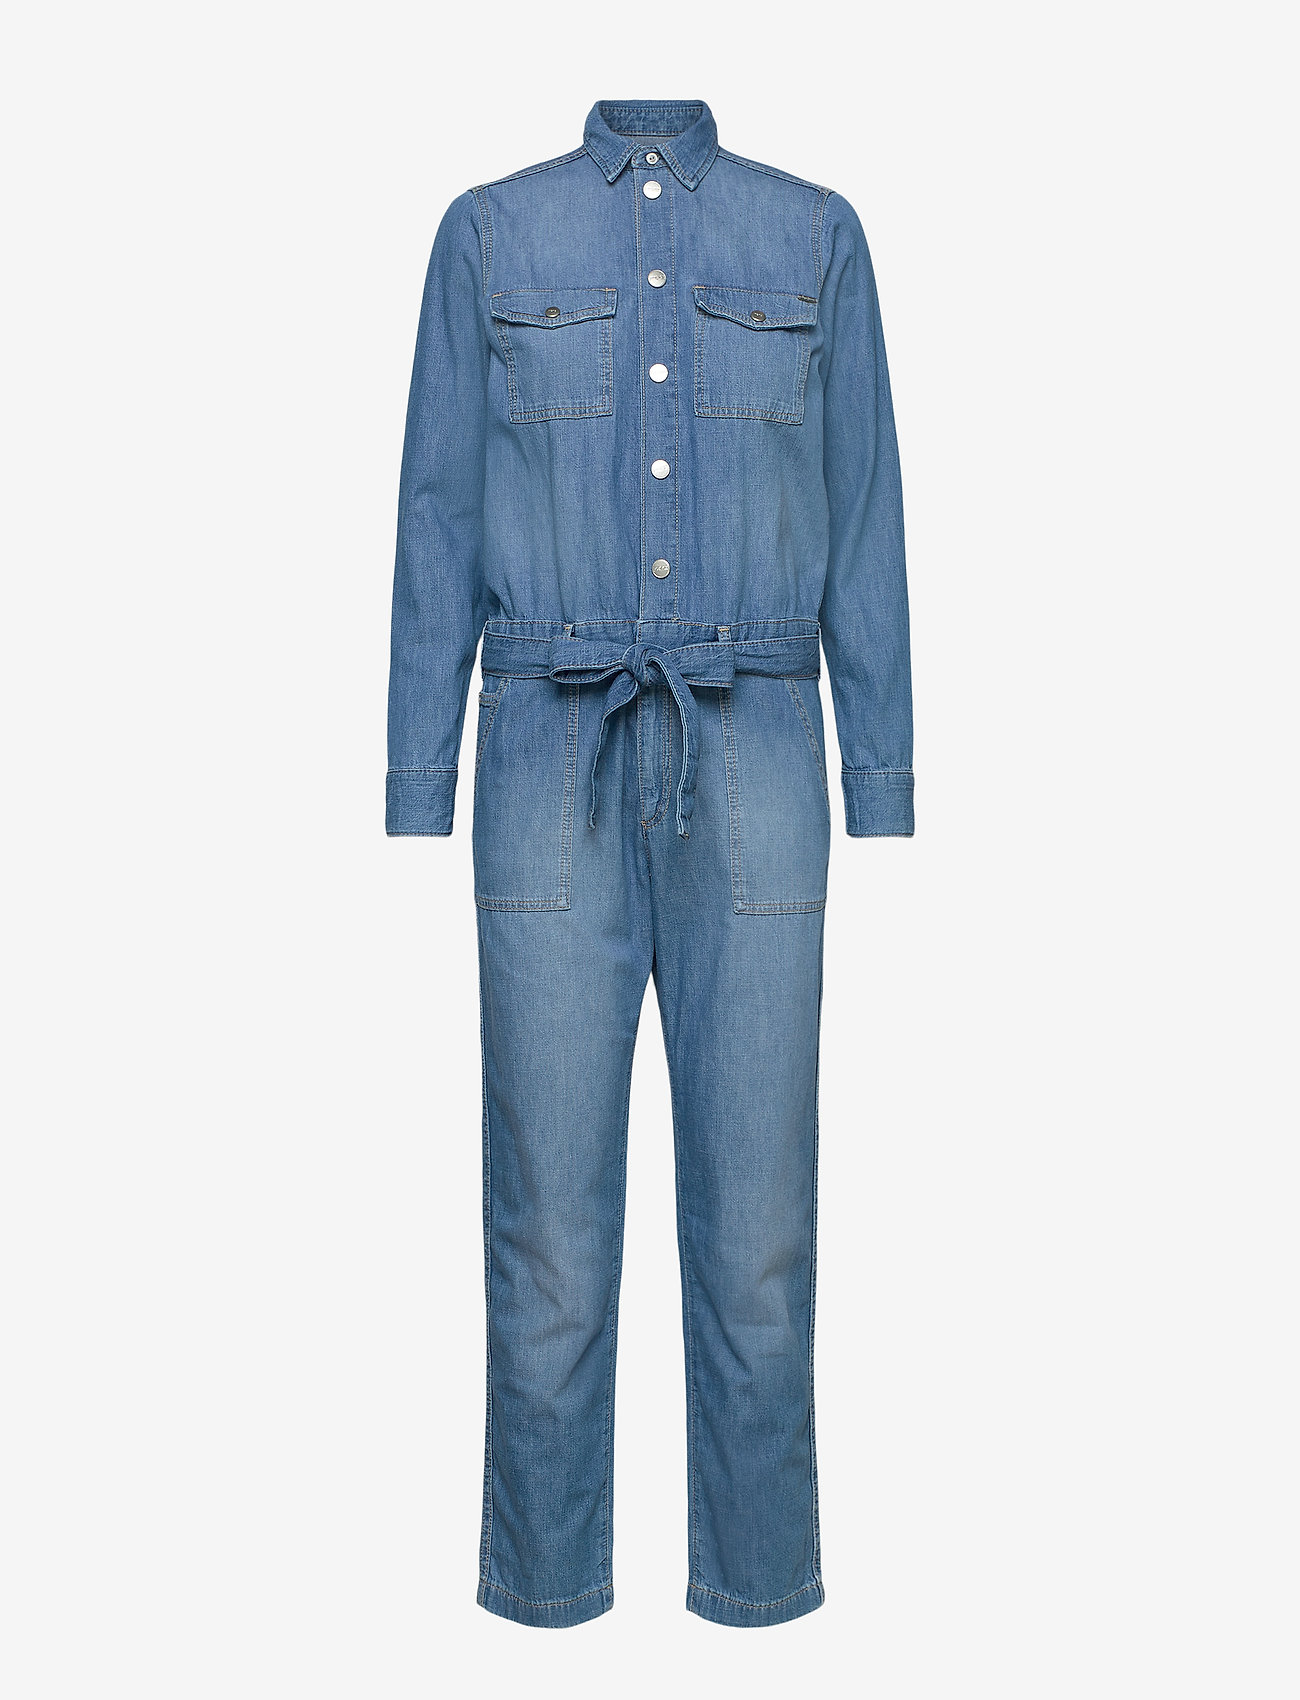 Pepe Jeans London - CHLEO BLUE - jumpsuits - denim - 0